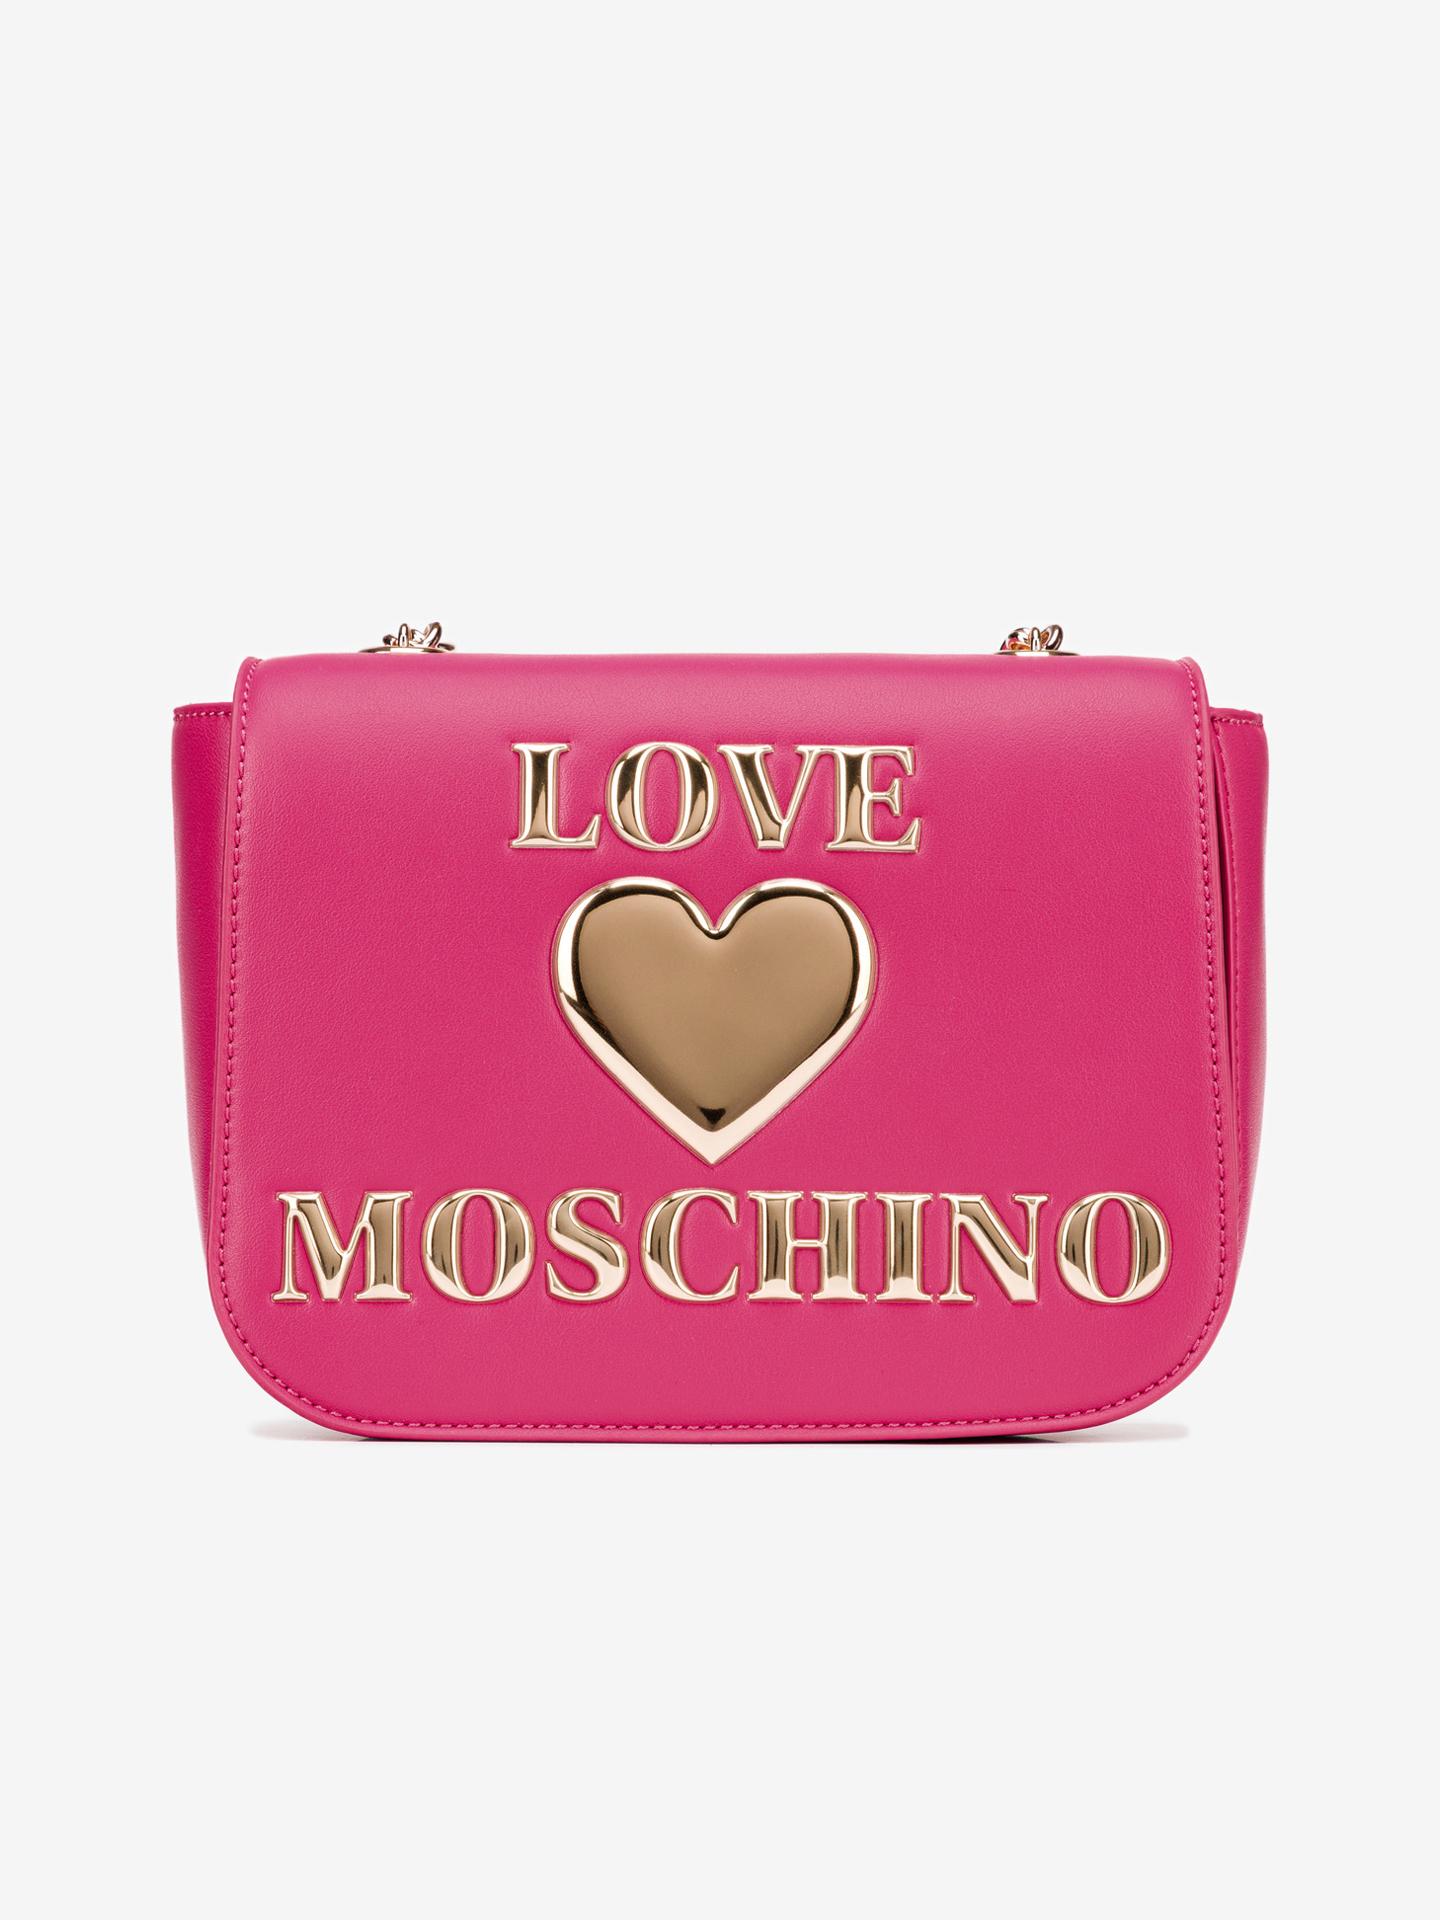 Love Moschino pink crossbody handbag